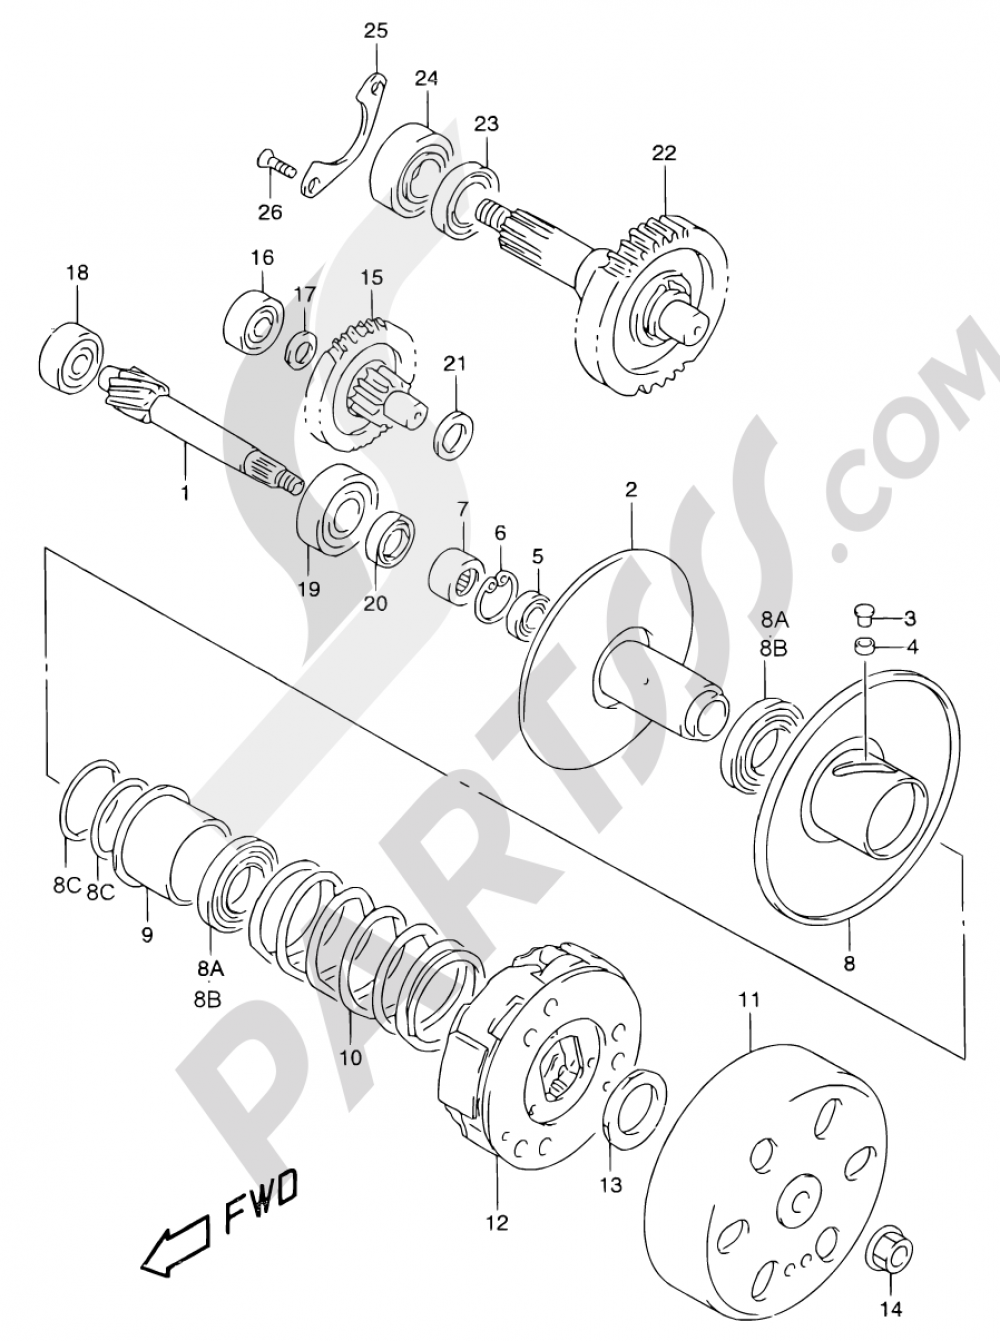 13B - TRANSMISSION (2) (MODEL AY50 K1) Suzuki KATANA AY50WR 2000